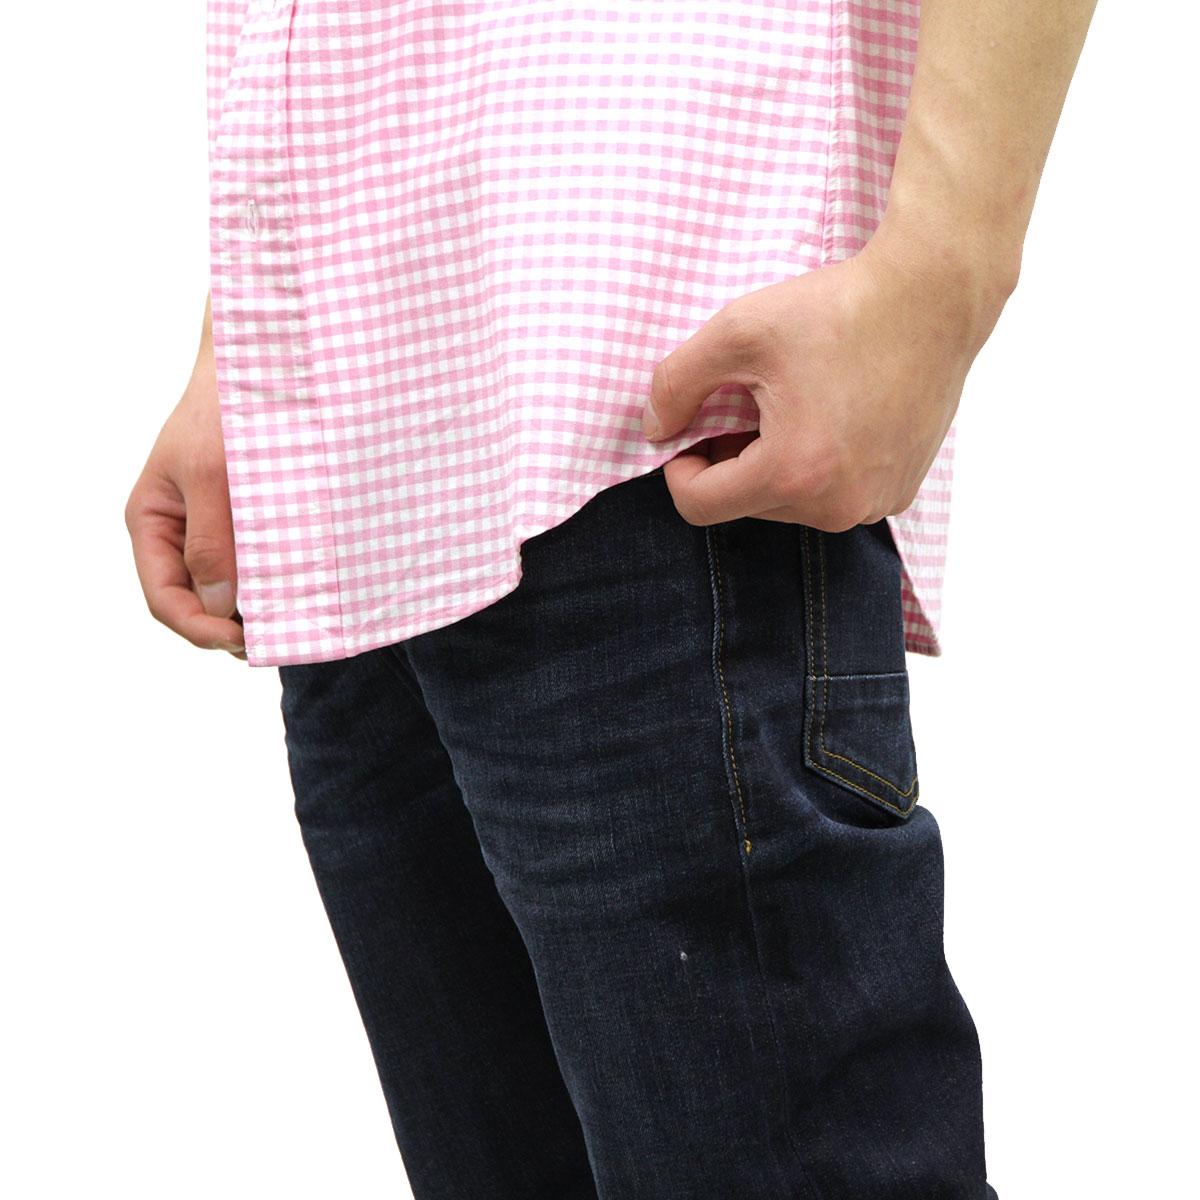 80abe6d4 50% off ralph lauren white button down shirt mens names b86e8 a0259